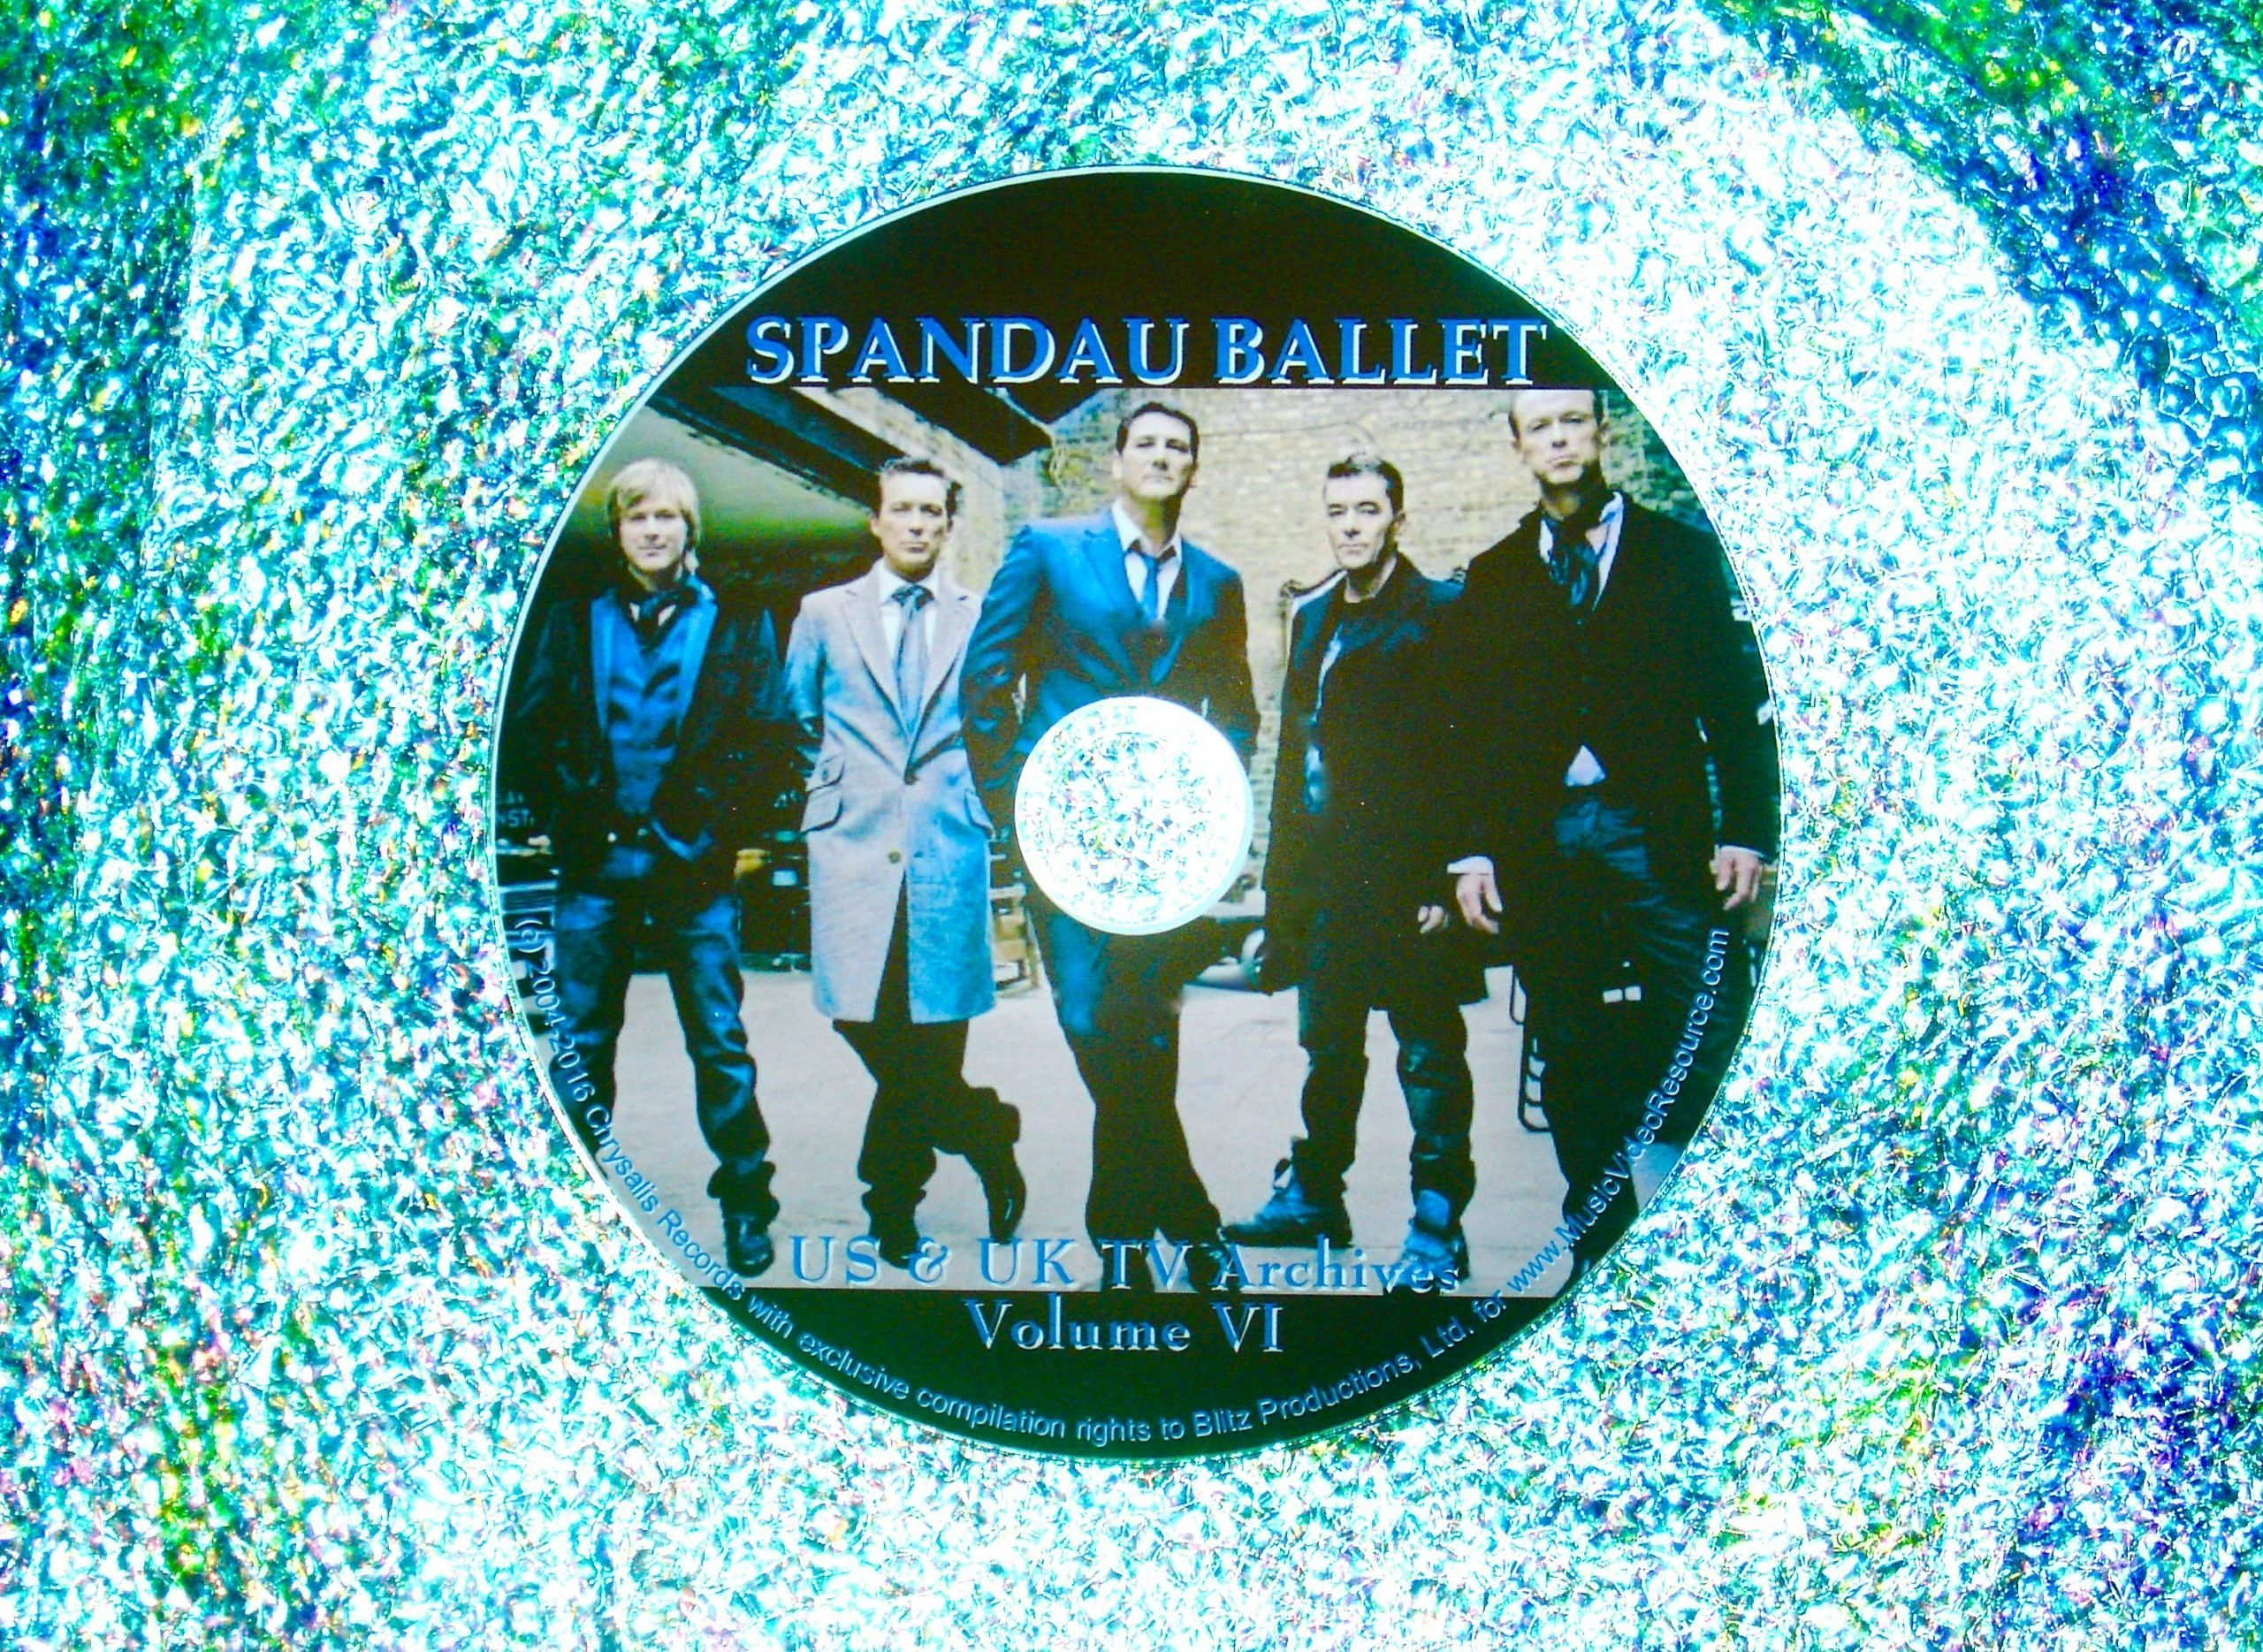 SPANDAU BALLET Video Archives 2014-2015 VOLUME VI